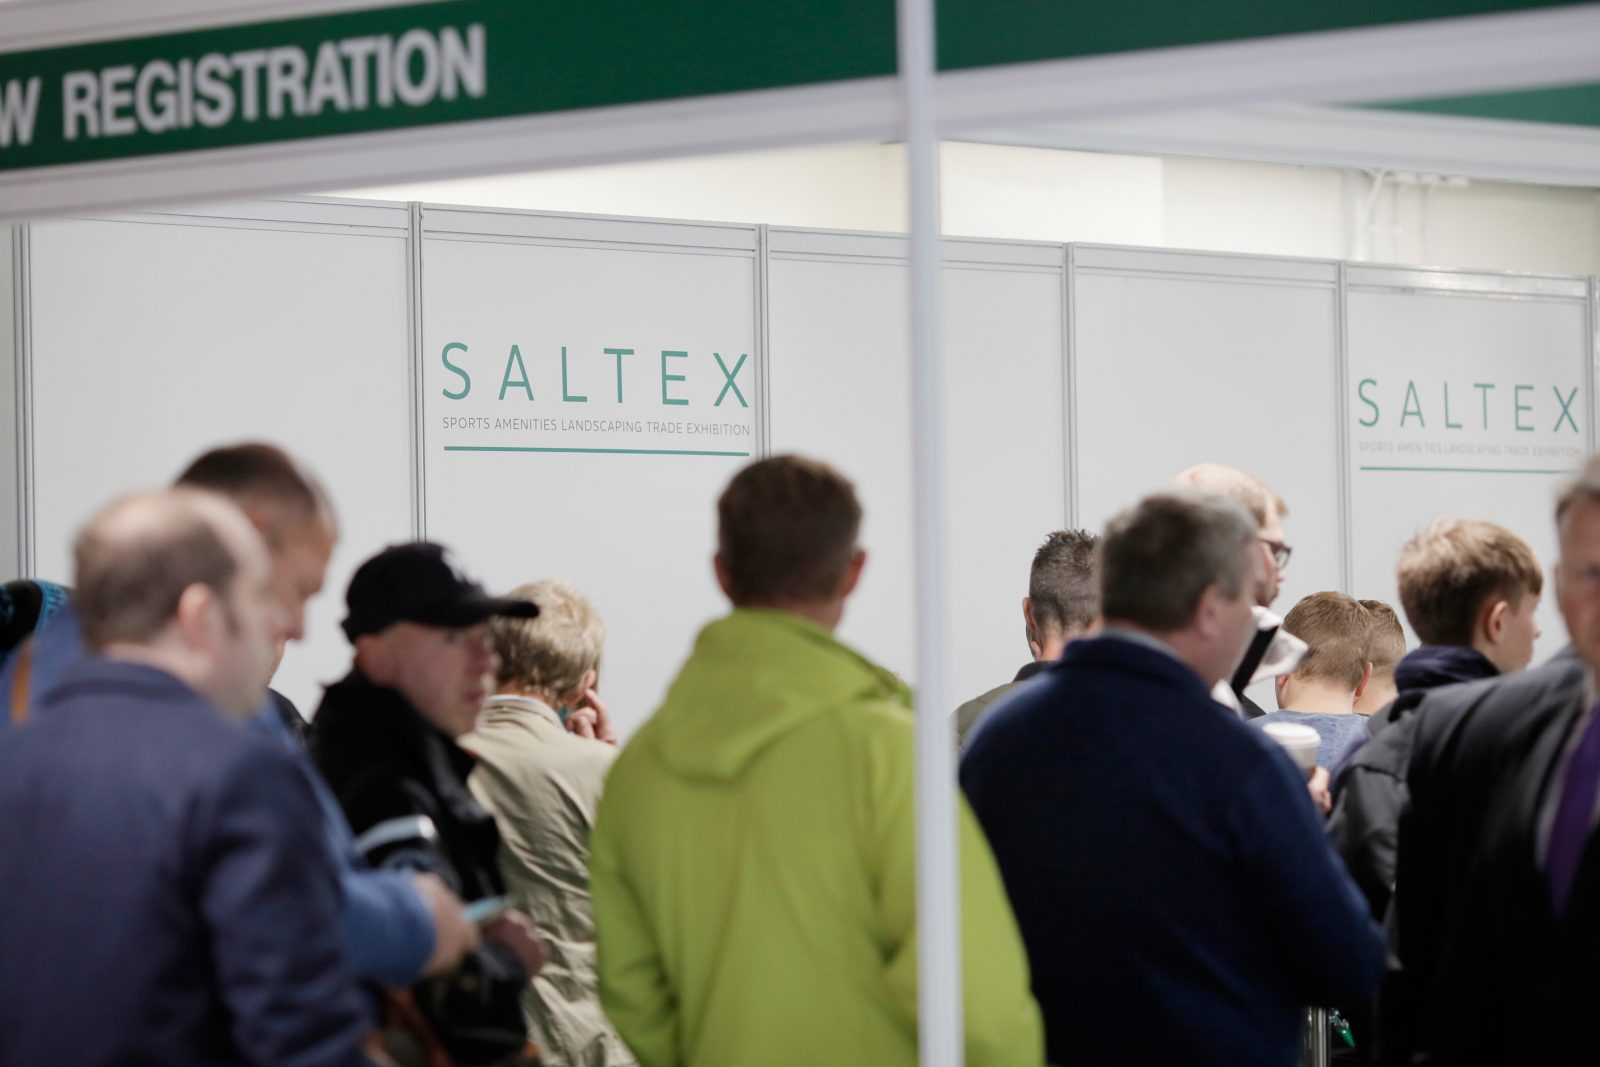 SALTEX 2021